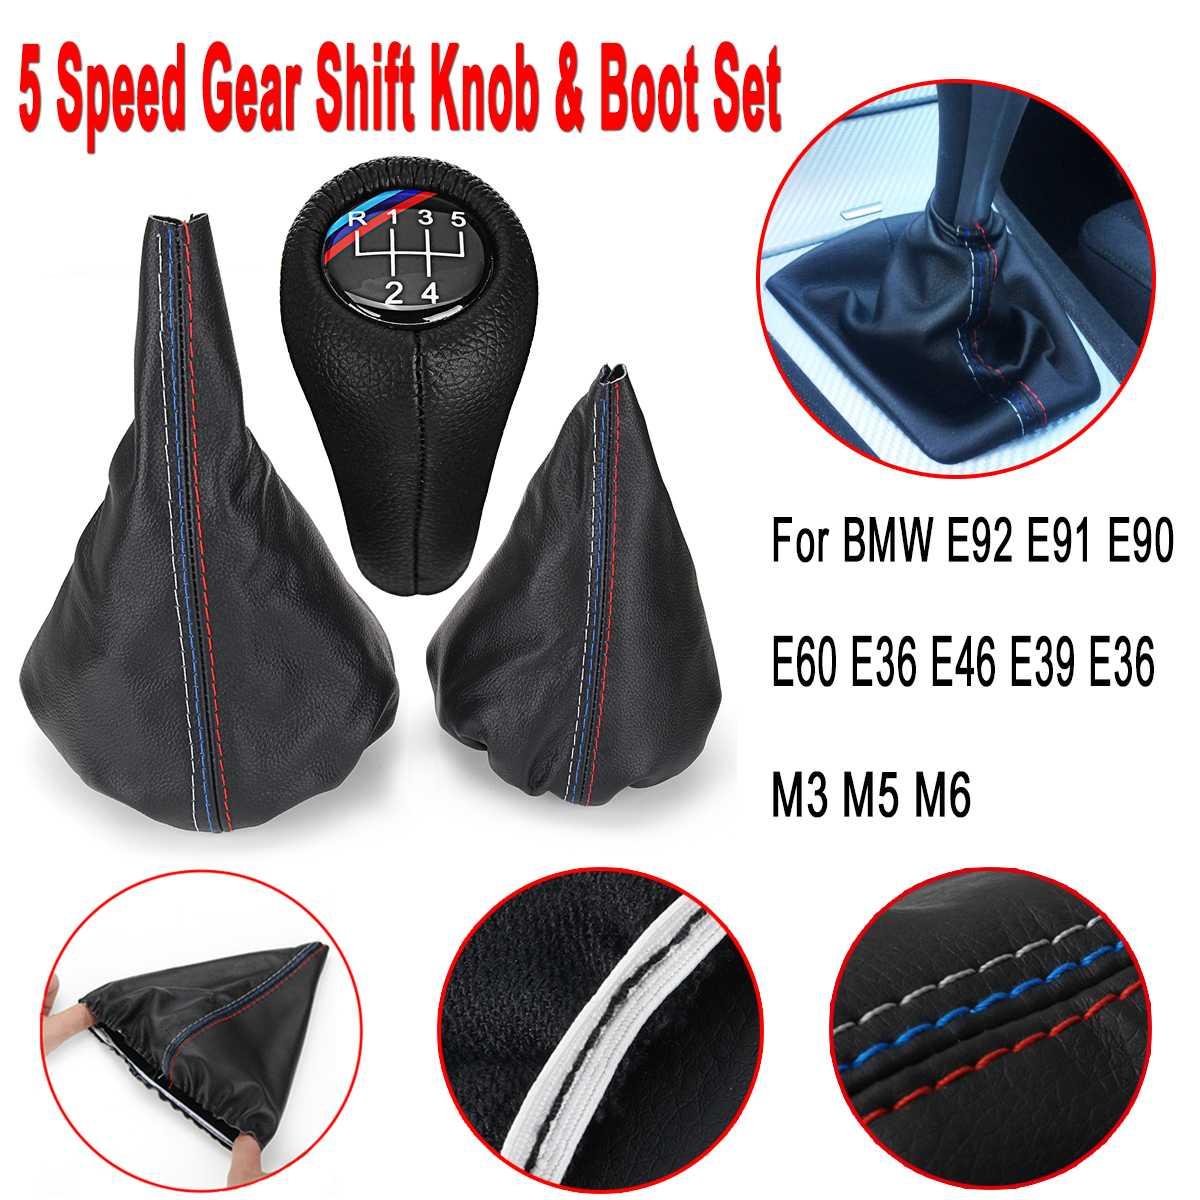 Leather 5 / 6 Speed Car Gear Shift Knob Shift Boot Brake Boot Set For E92 E91 E90 E60 E46 E39 E36 M3 M5 M6